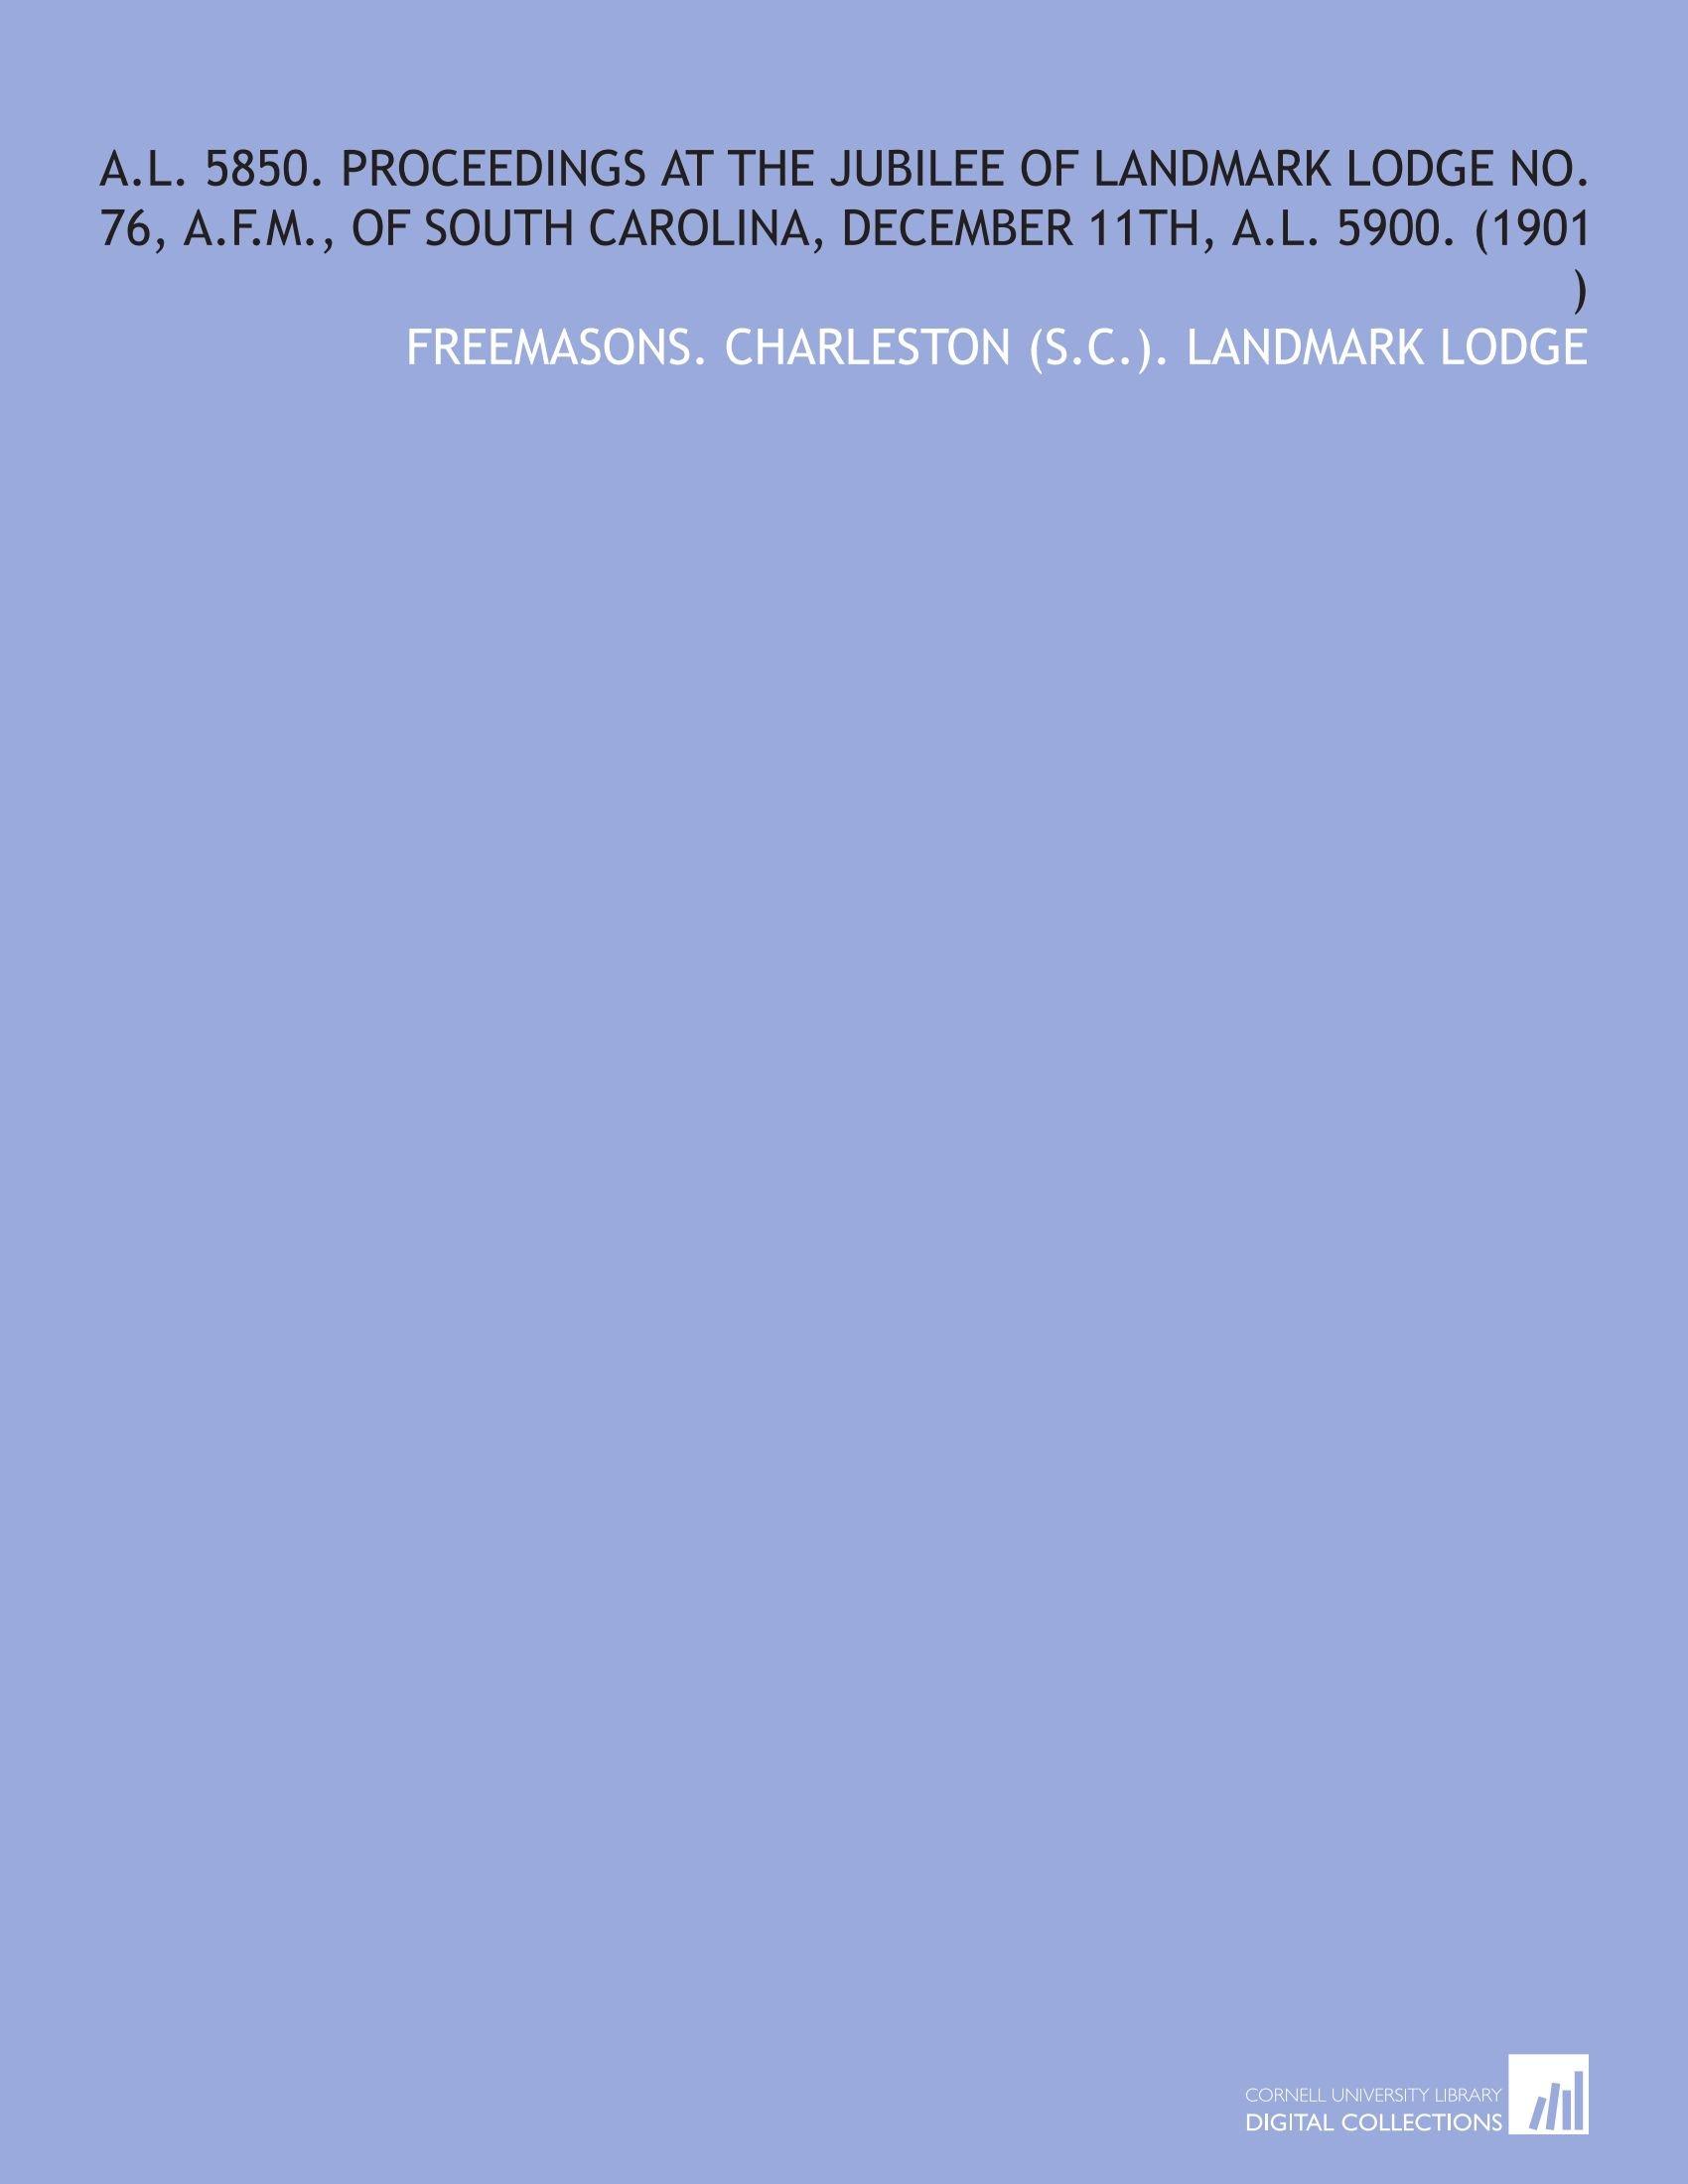 A.L. 5850. Proceedings at the Jubilee of Landmark Lodge No. 76, a.F.M., of South Carolina, December 11th, a.L. 5900. (1901 ) pdf